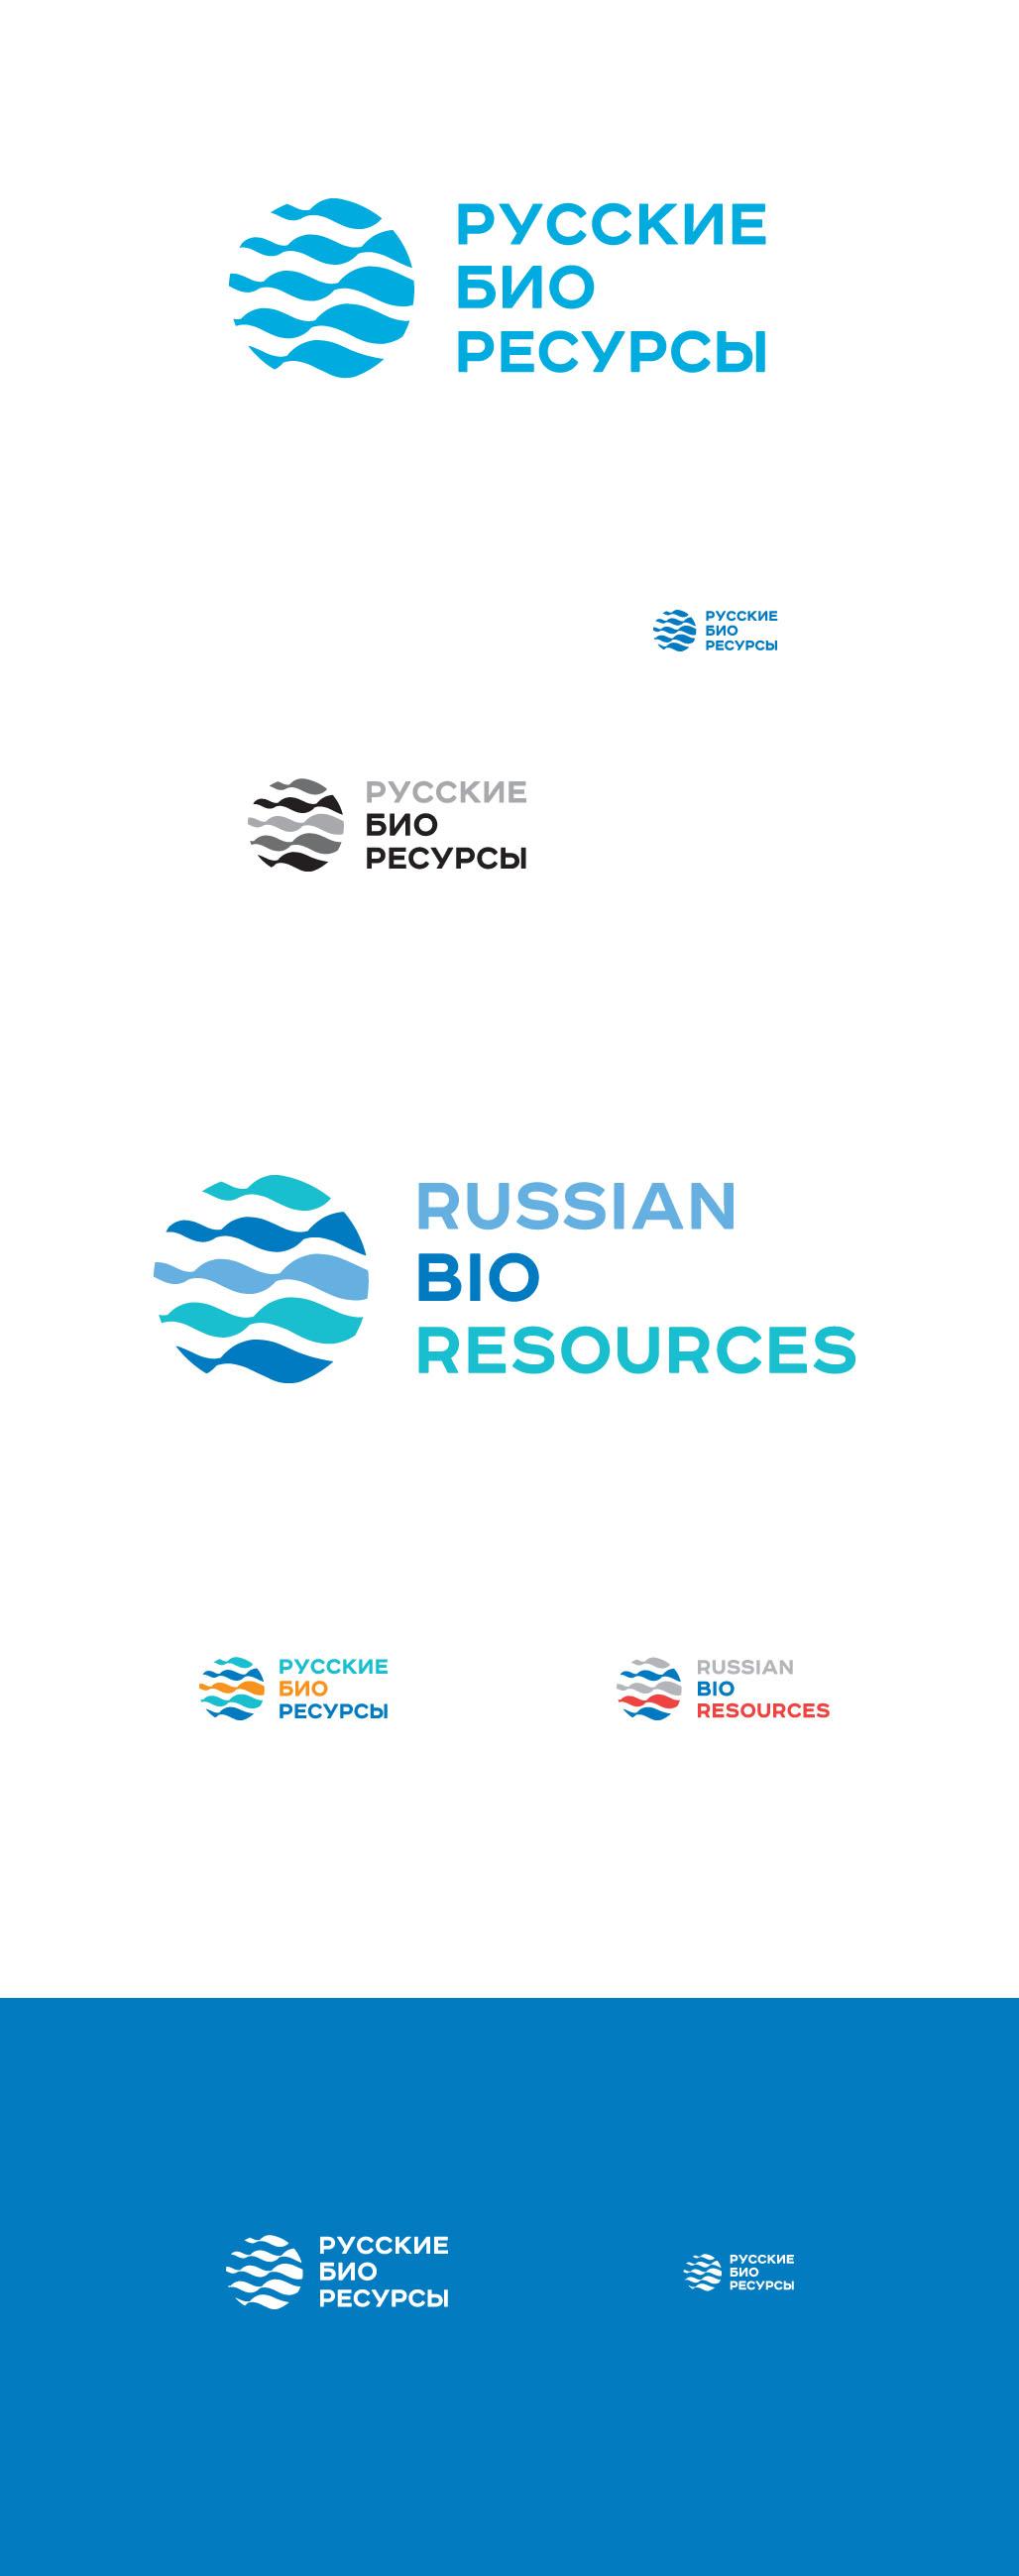 Разработка логотипа для компании «Русские Био Ресурсы» фото f_30658f9bcb251c0e.jpg